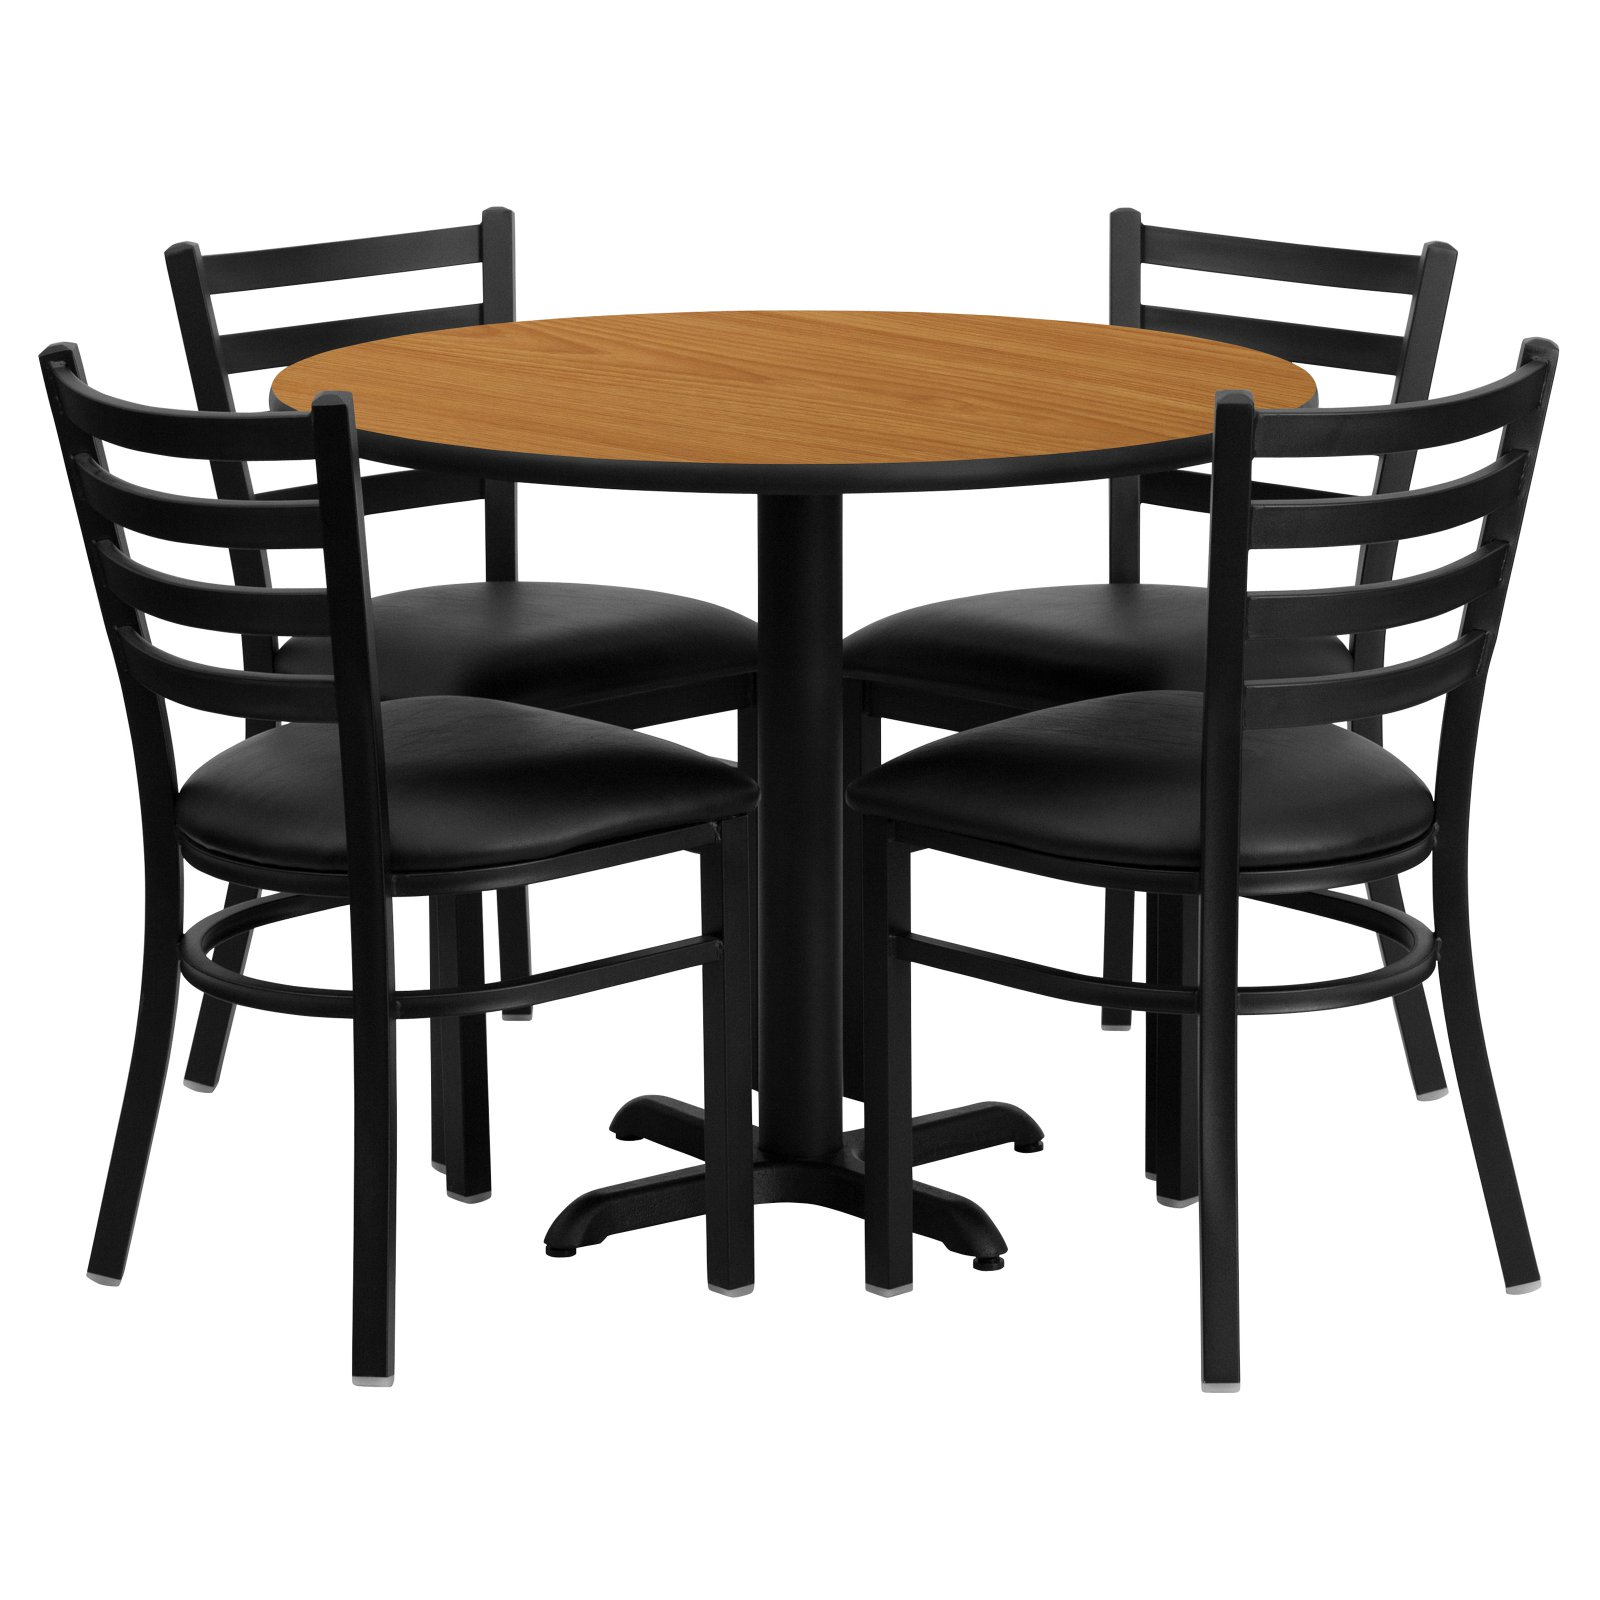 Flash Furniture 36'' Round Natural Laminate Table Set with 4 Ladder Back Metal Chairs, Black Vinyl Seat Black, Natural